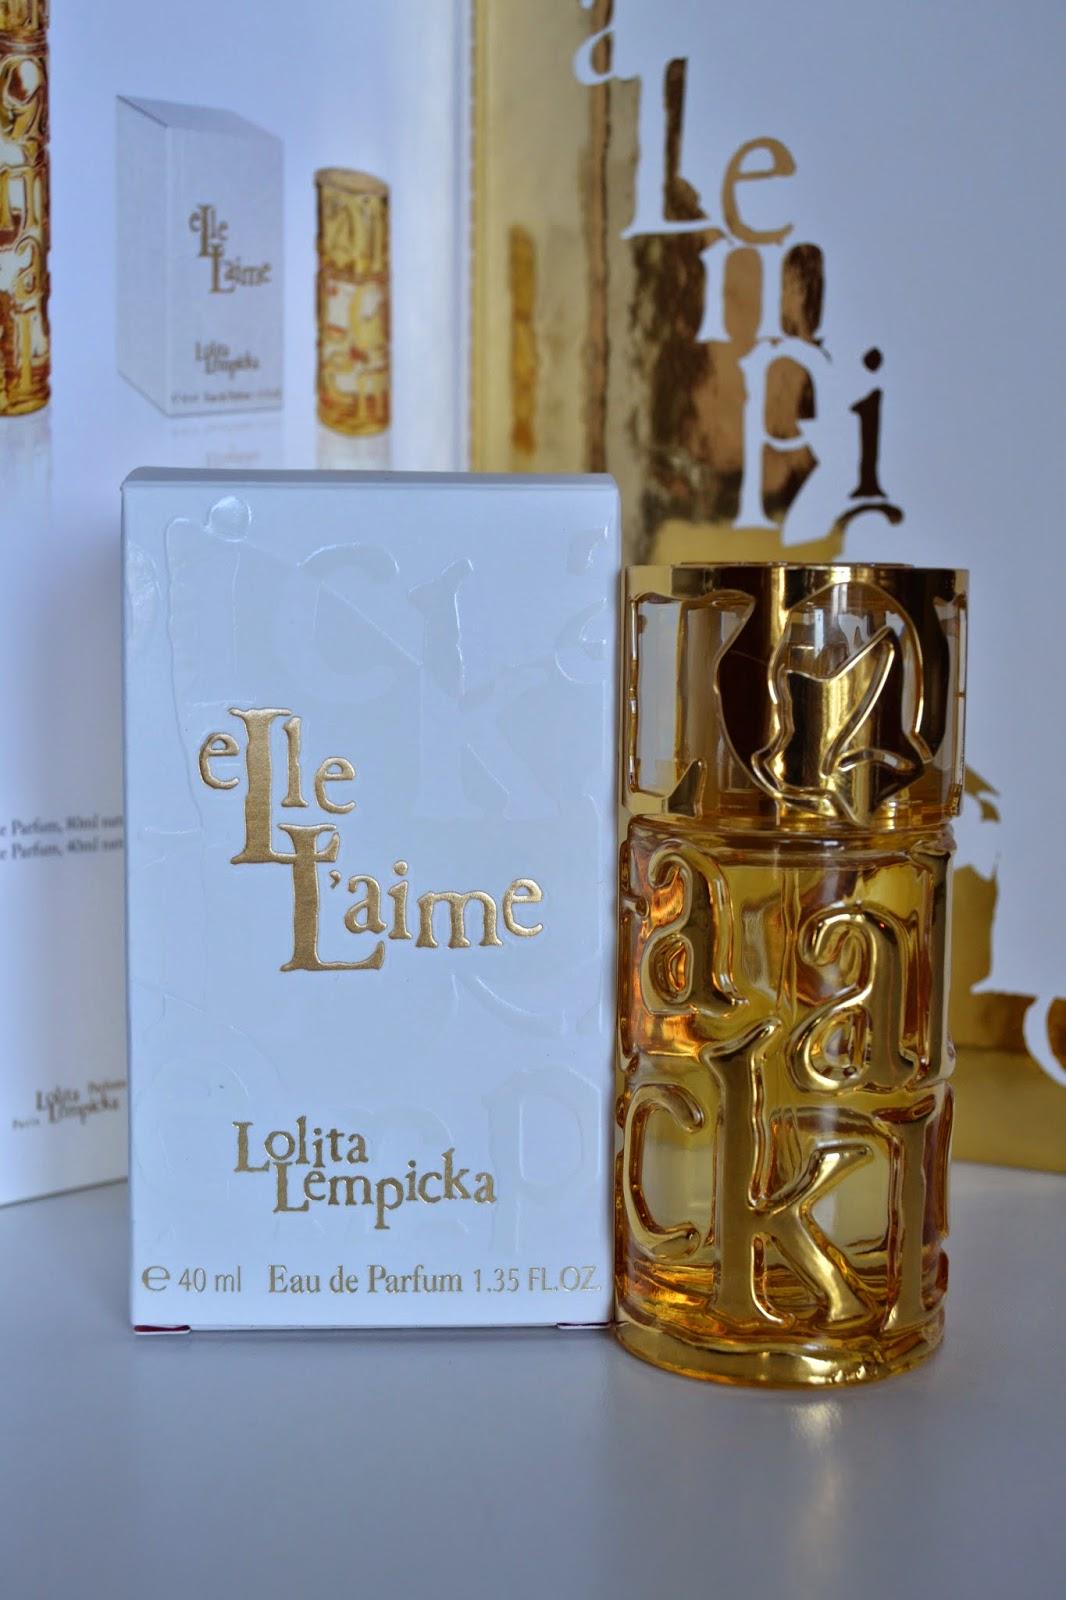 lolita lempicka -  elle l'aime - parfüm - favori parfümler - perfume